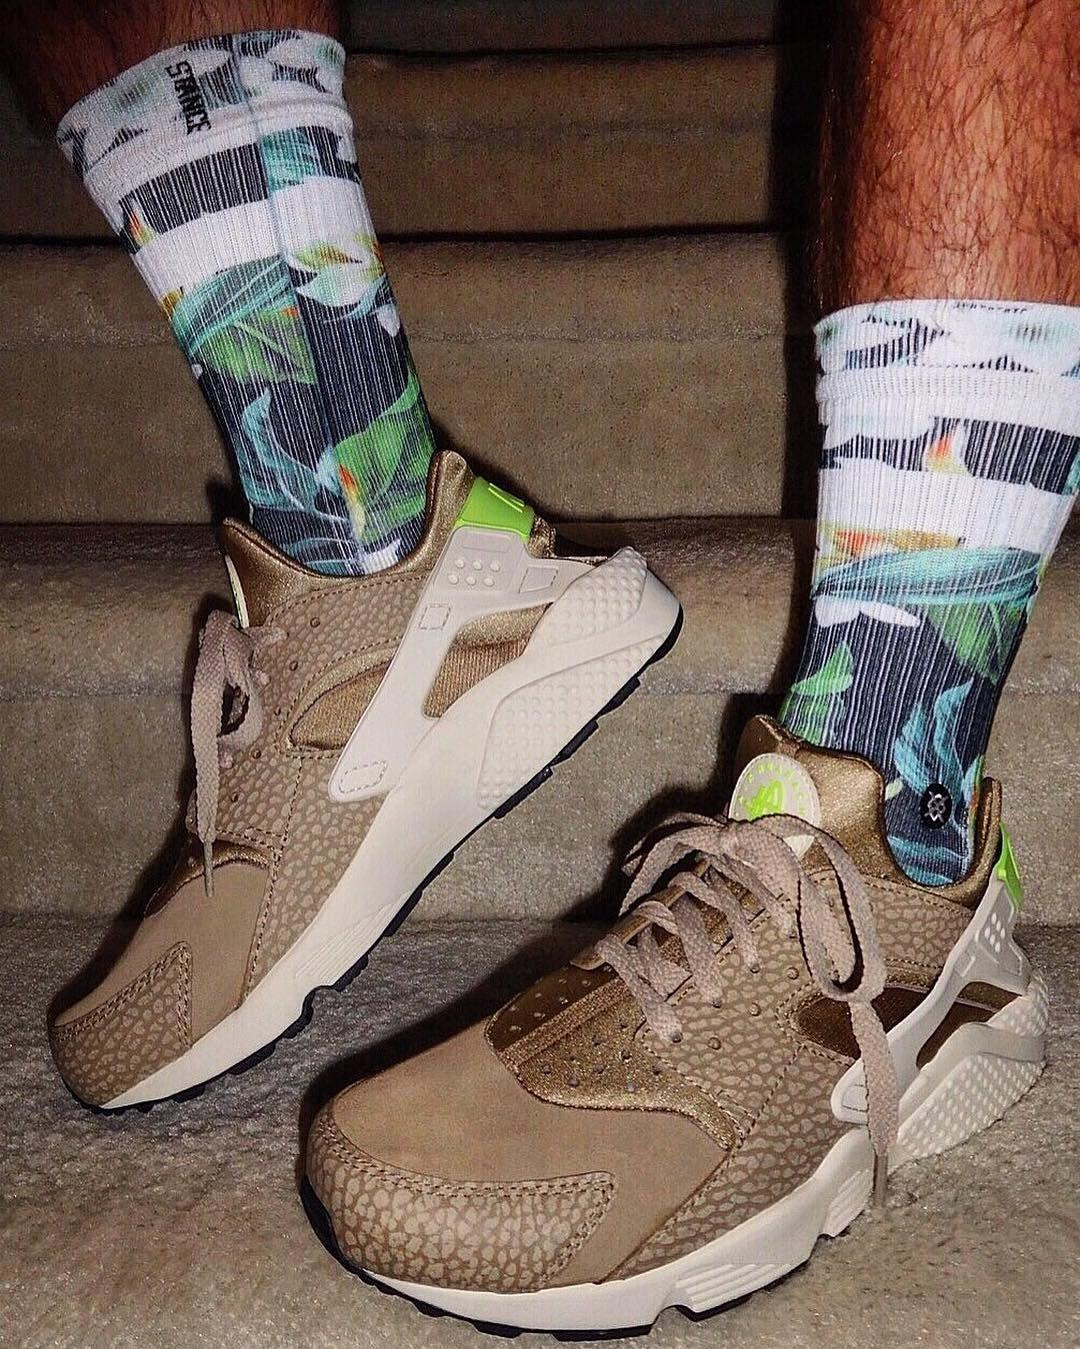 7f2236f5af944 All about sneakers  kiersanii Shoes-  Nike Air Huarache Premium Socks…